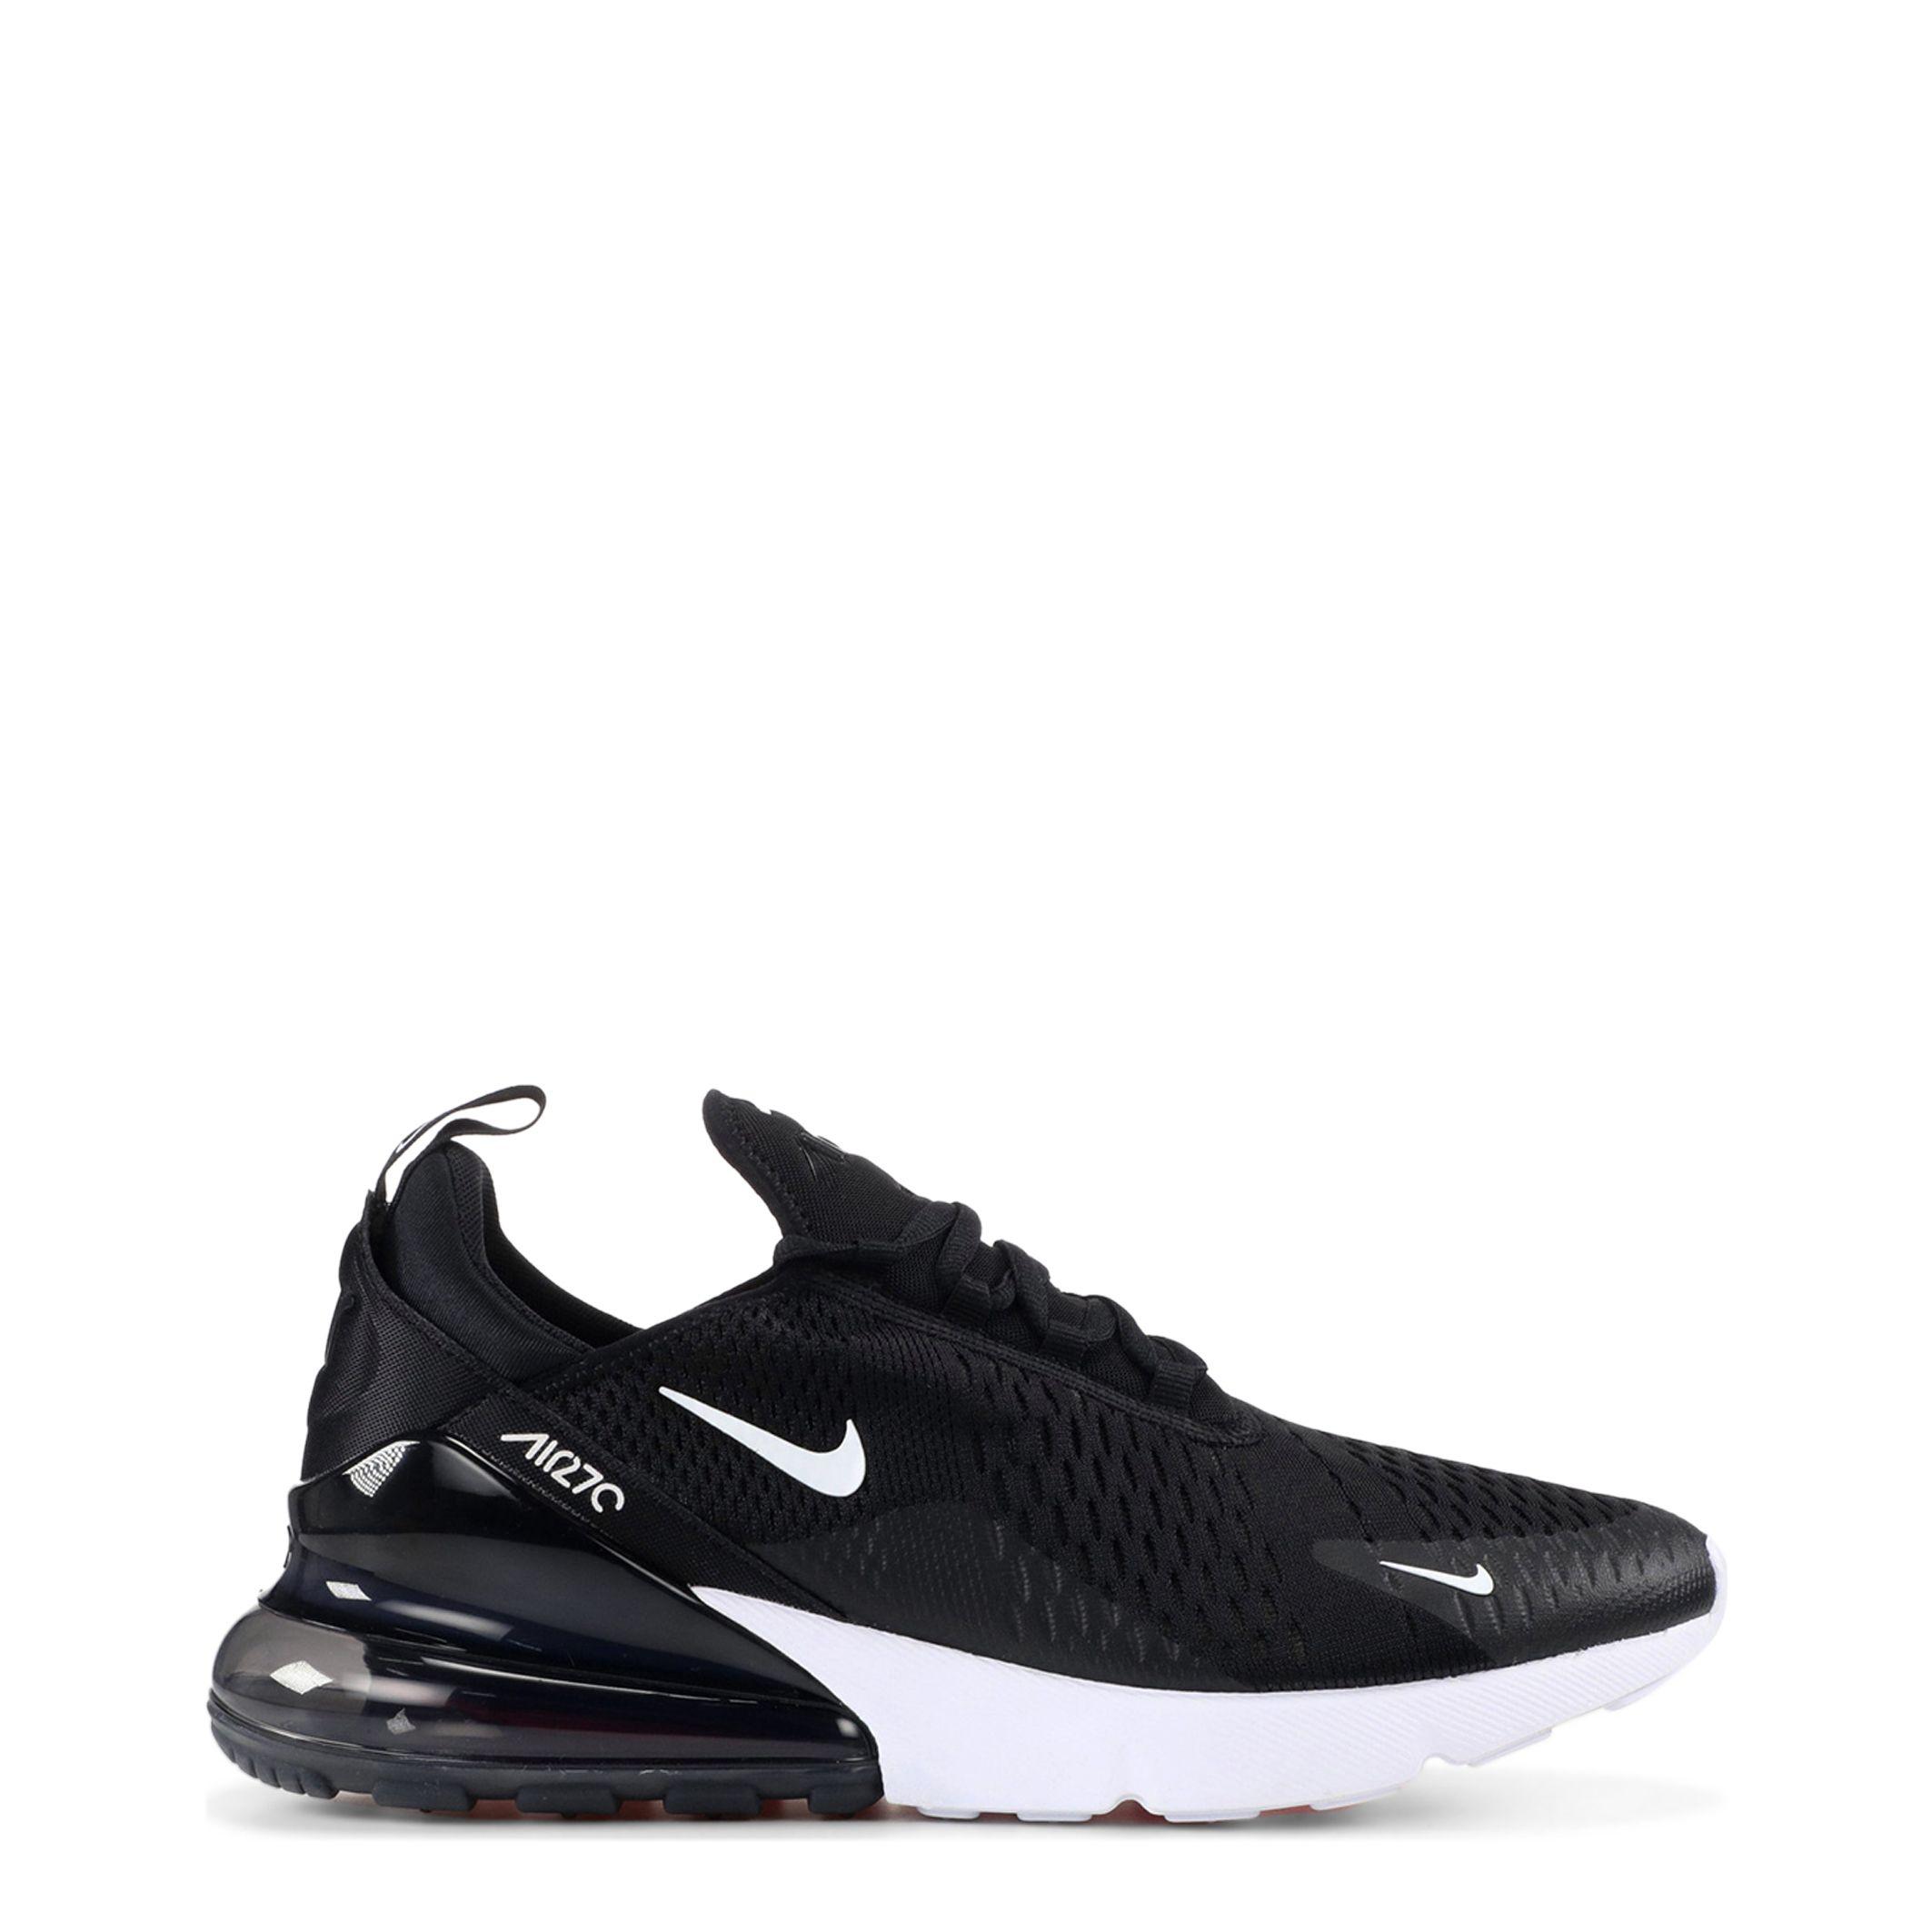 Nike – AirMax270